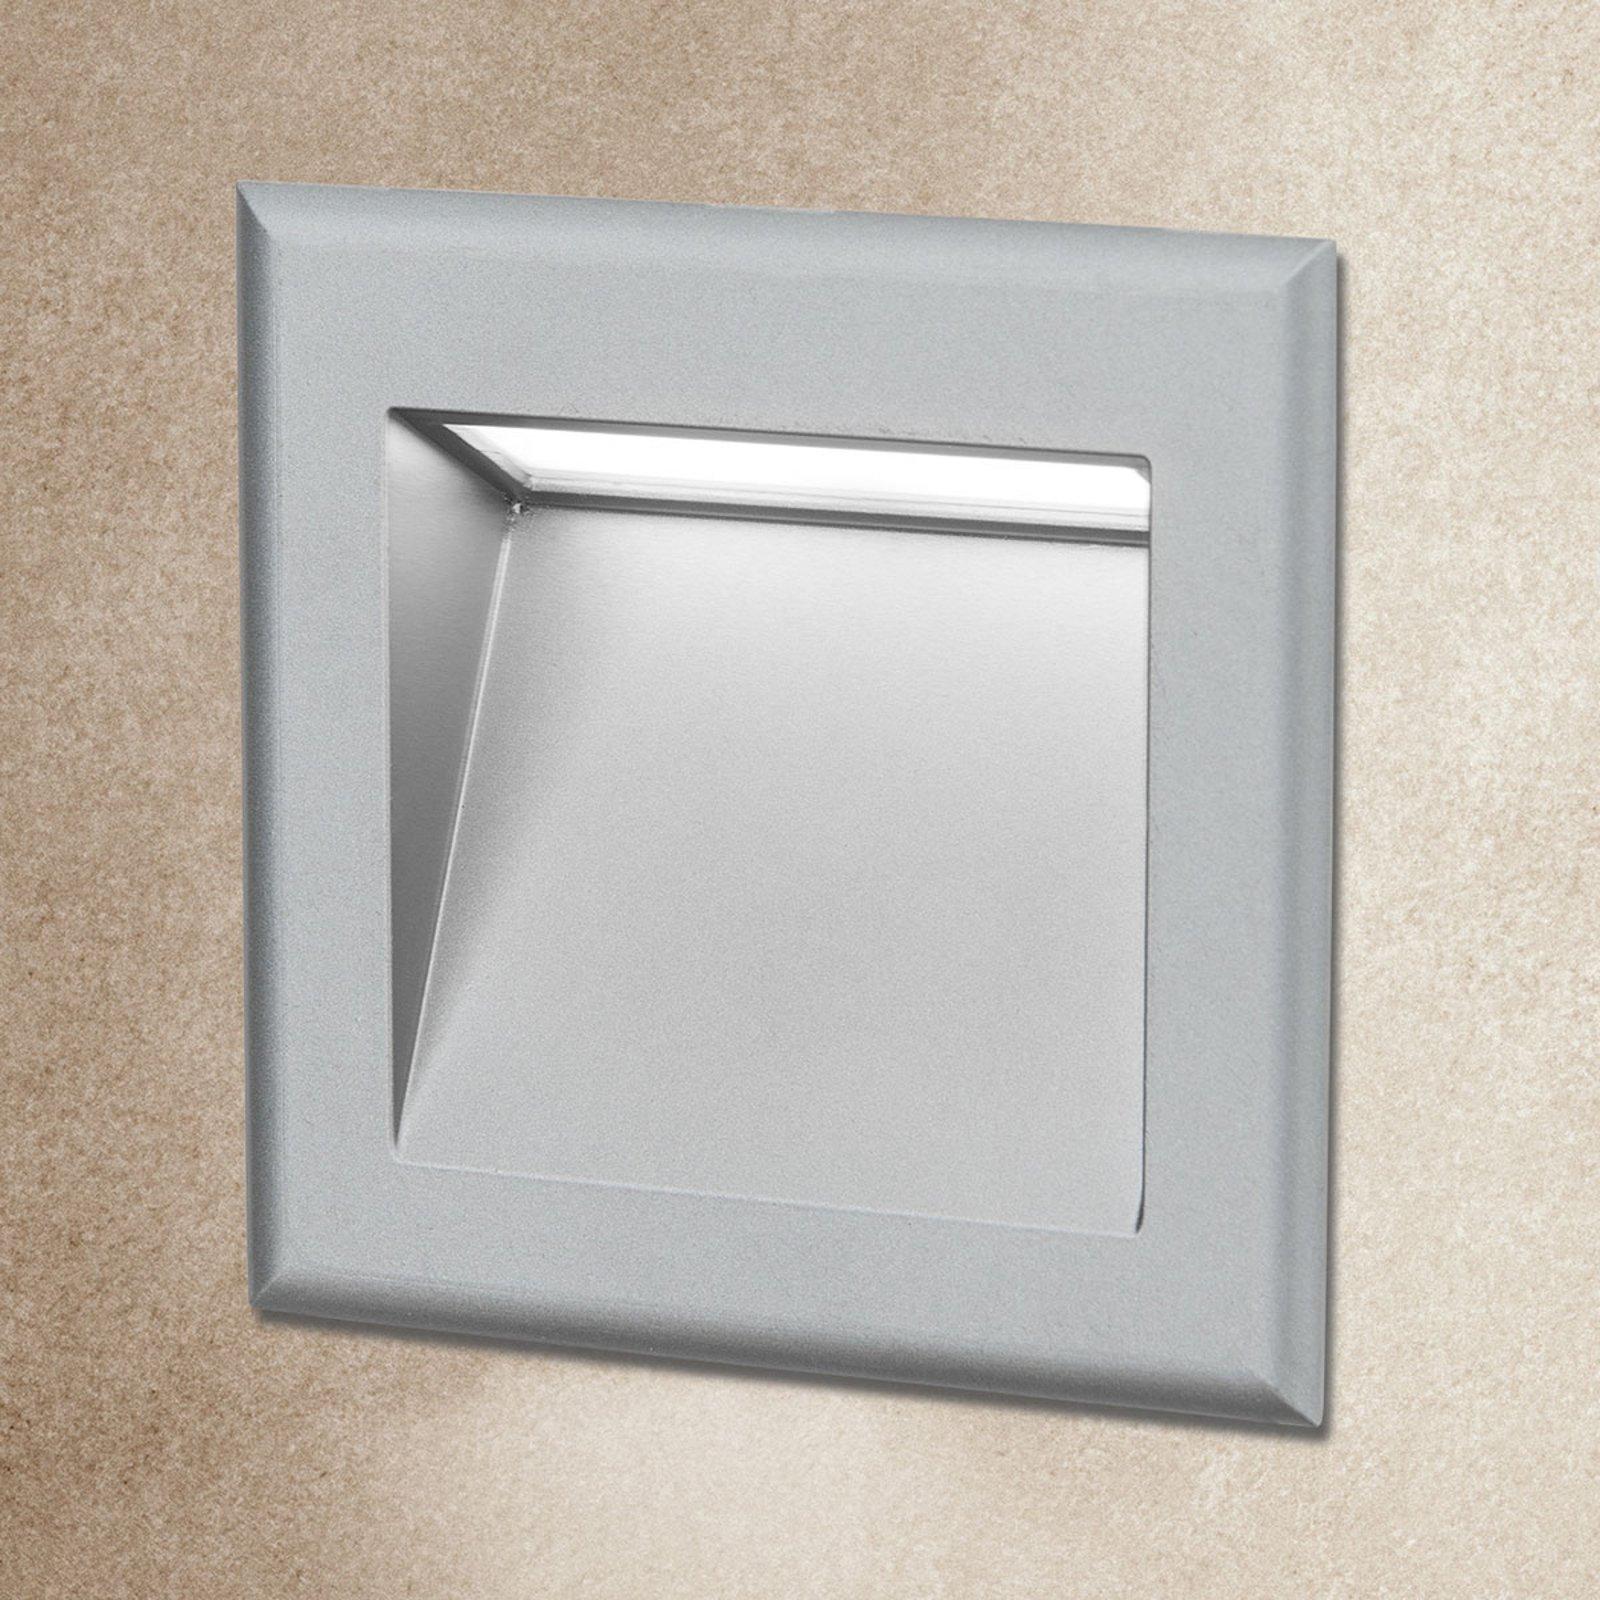 LED-vegginnfelligslampe Stairs for trappebelysning